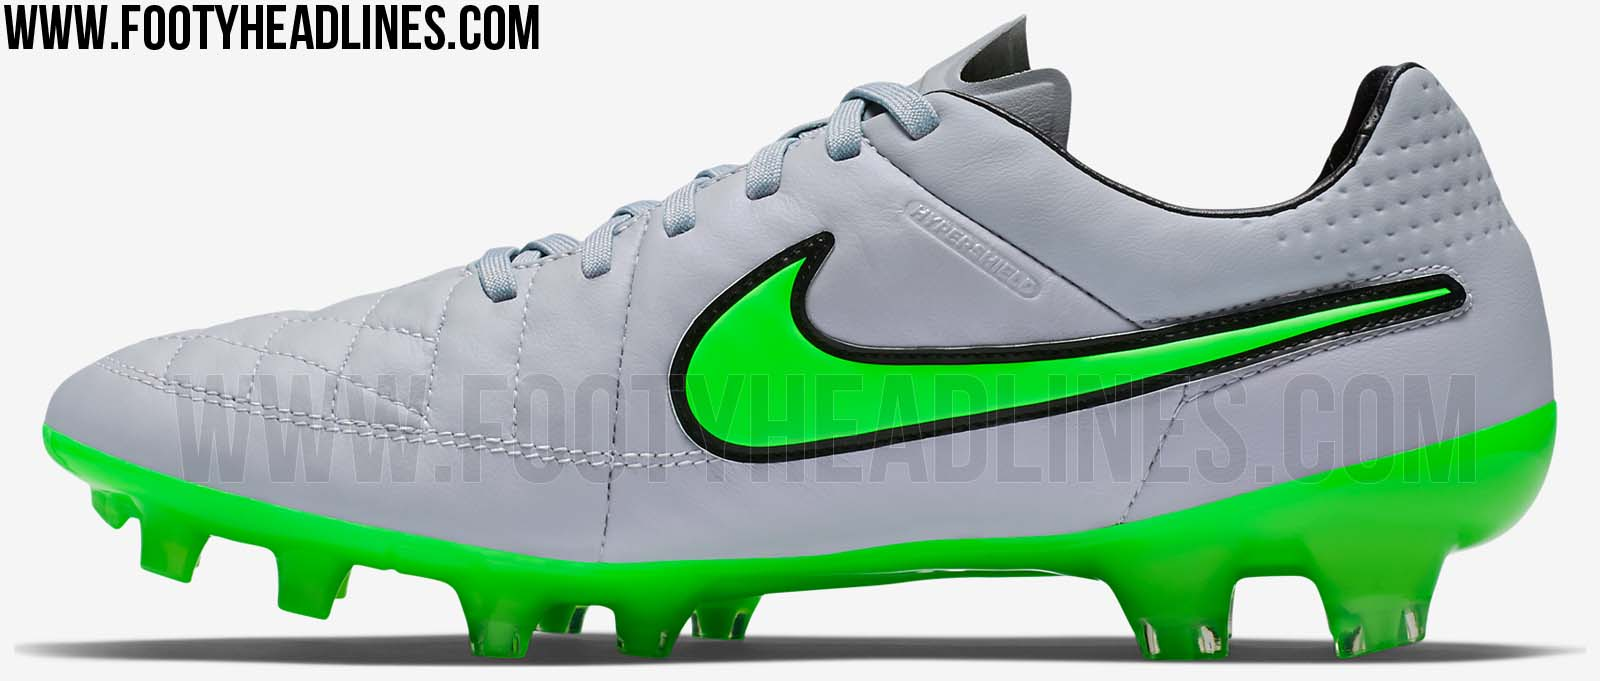 Silver / Green Nike Tiempo Legend V 2015-2016 Boots Released